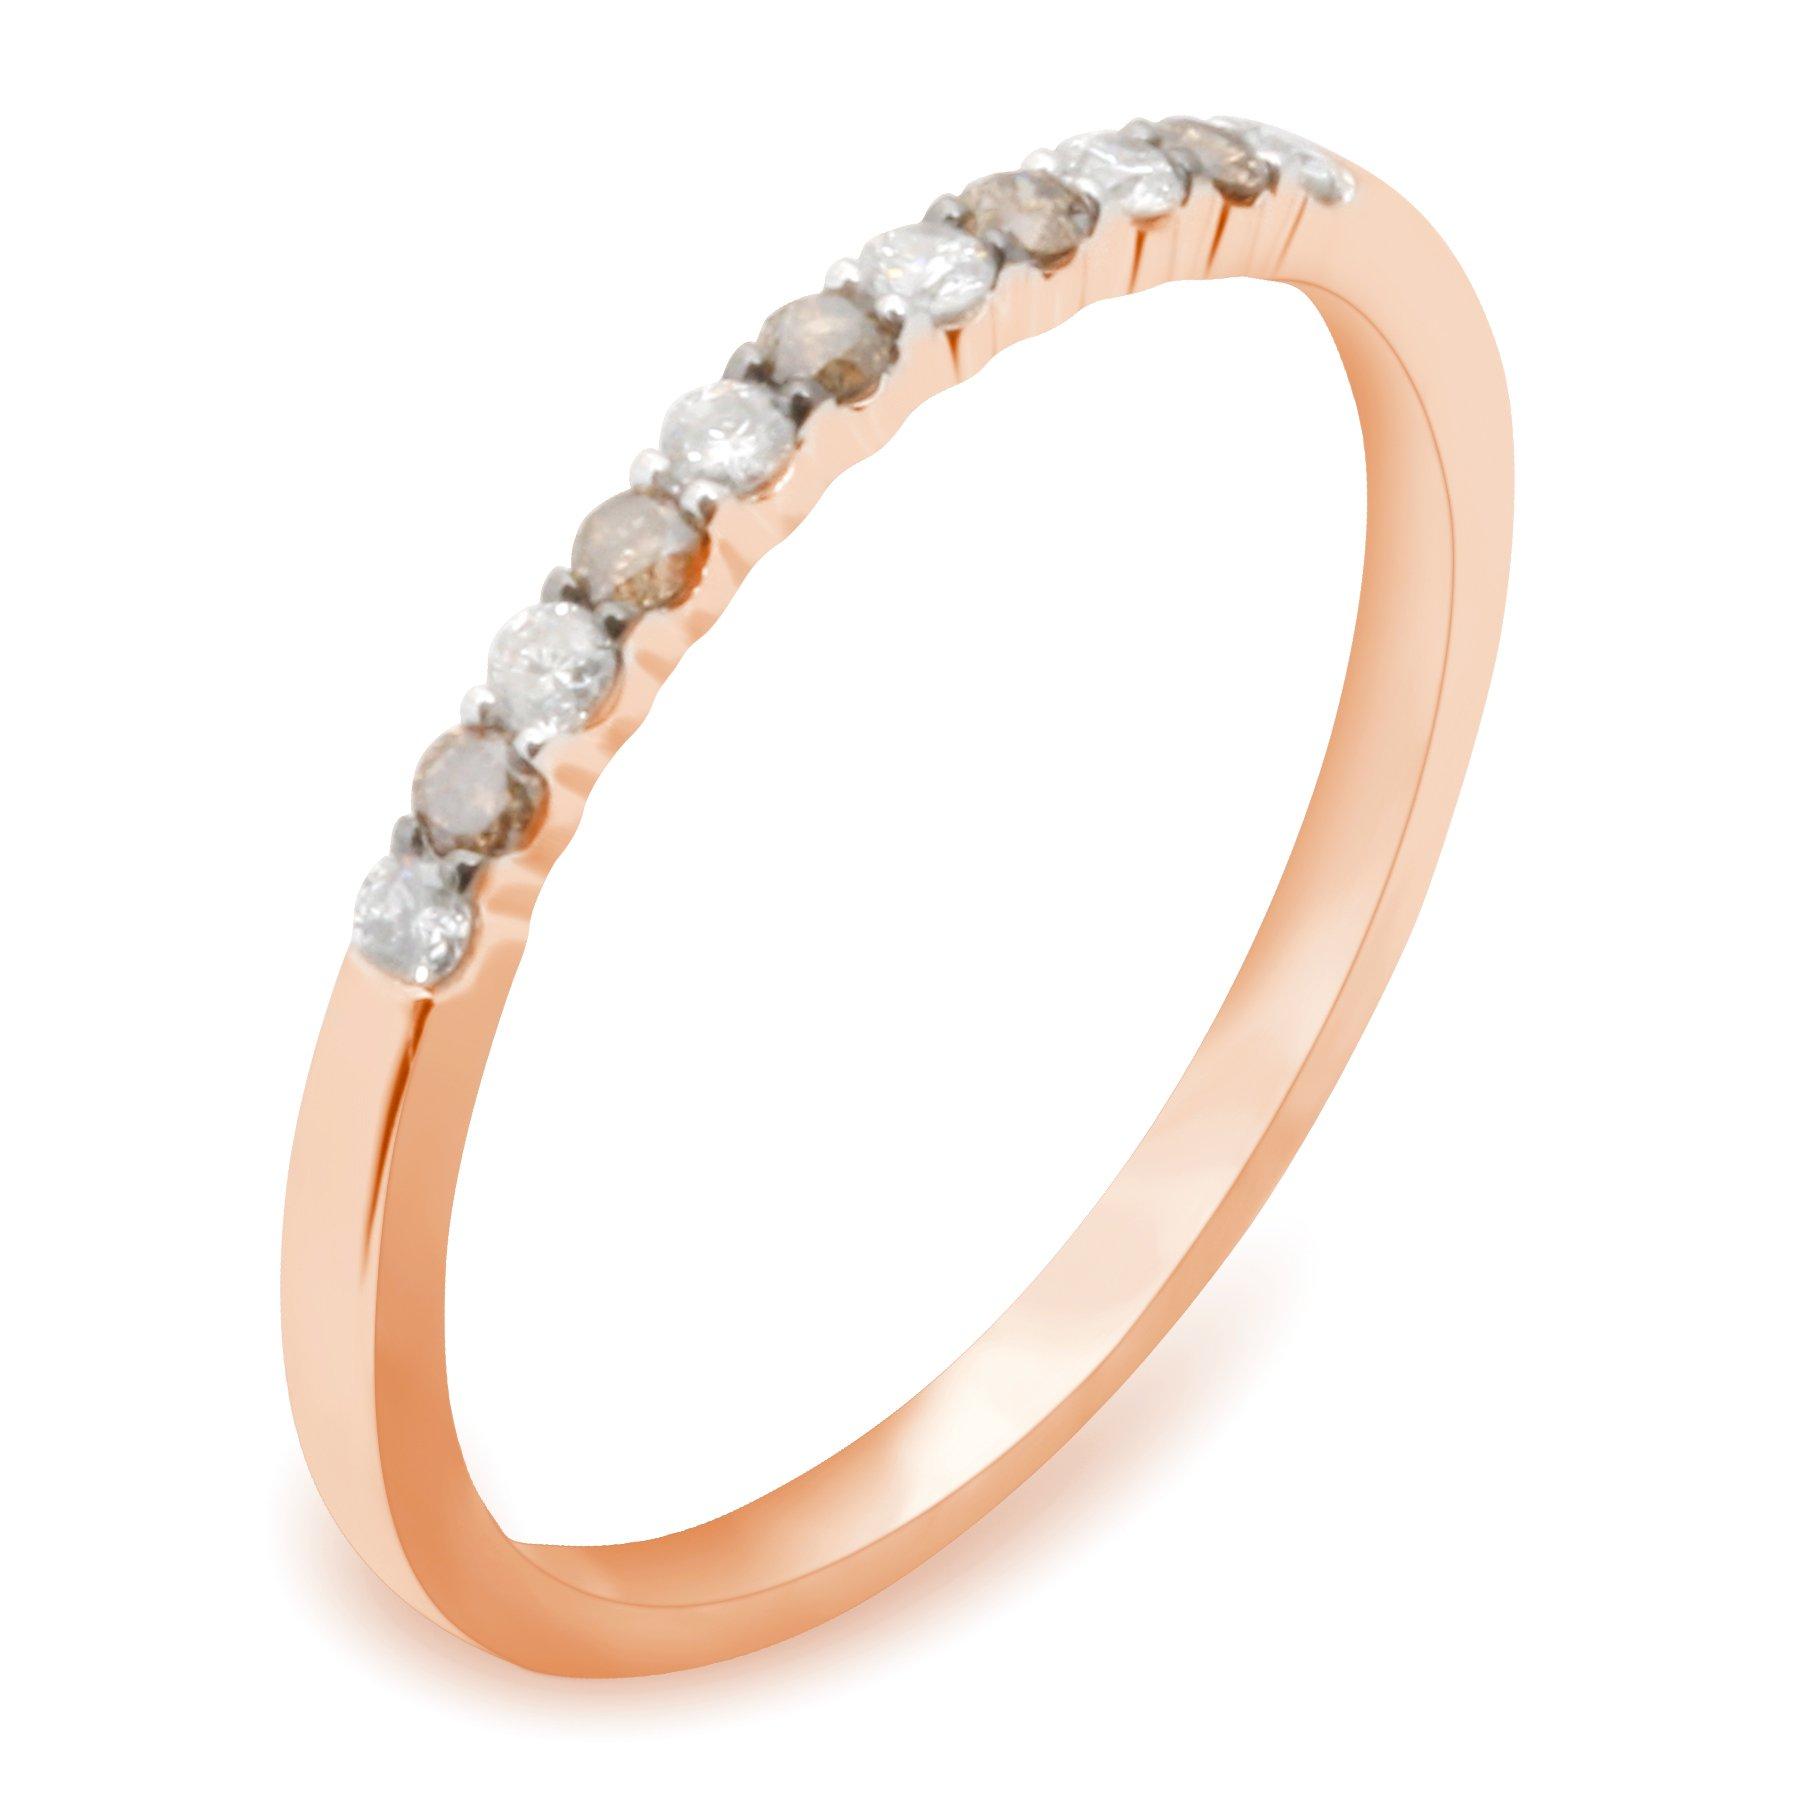 Prism Jewel Round Natural Brown & White Diamond Wedding Band, 10k Rose Gold, Size 10